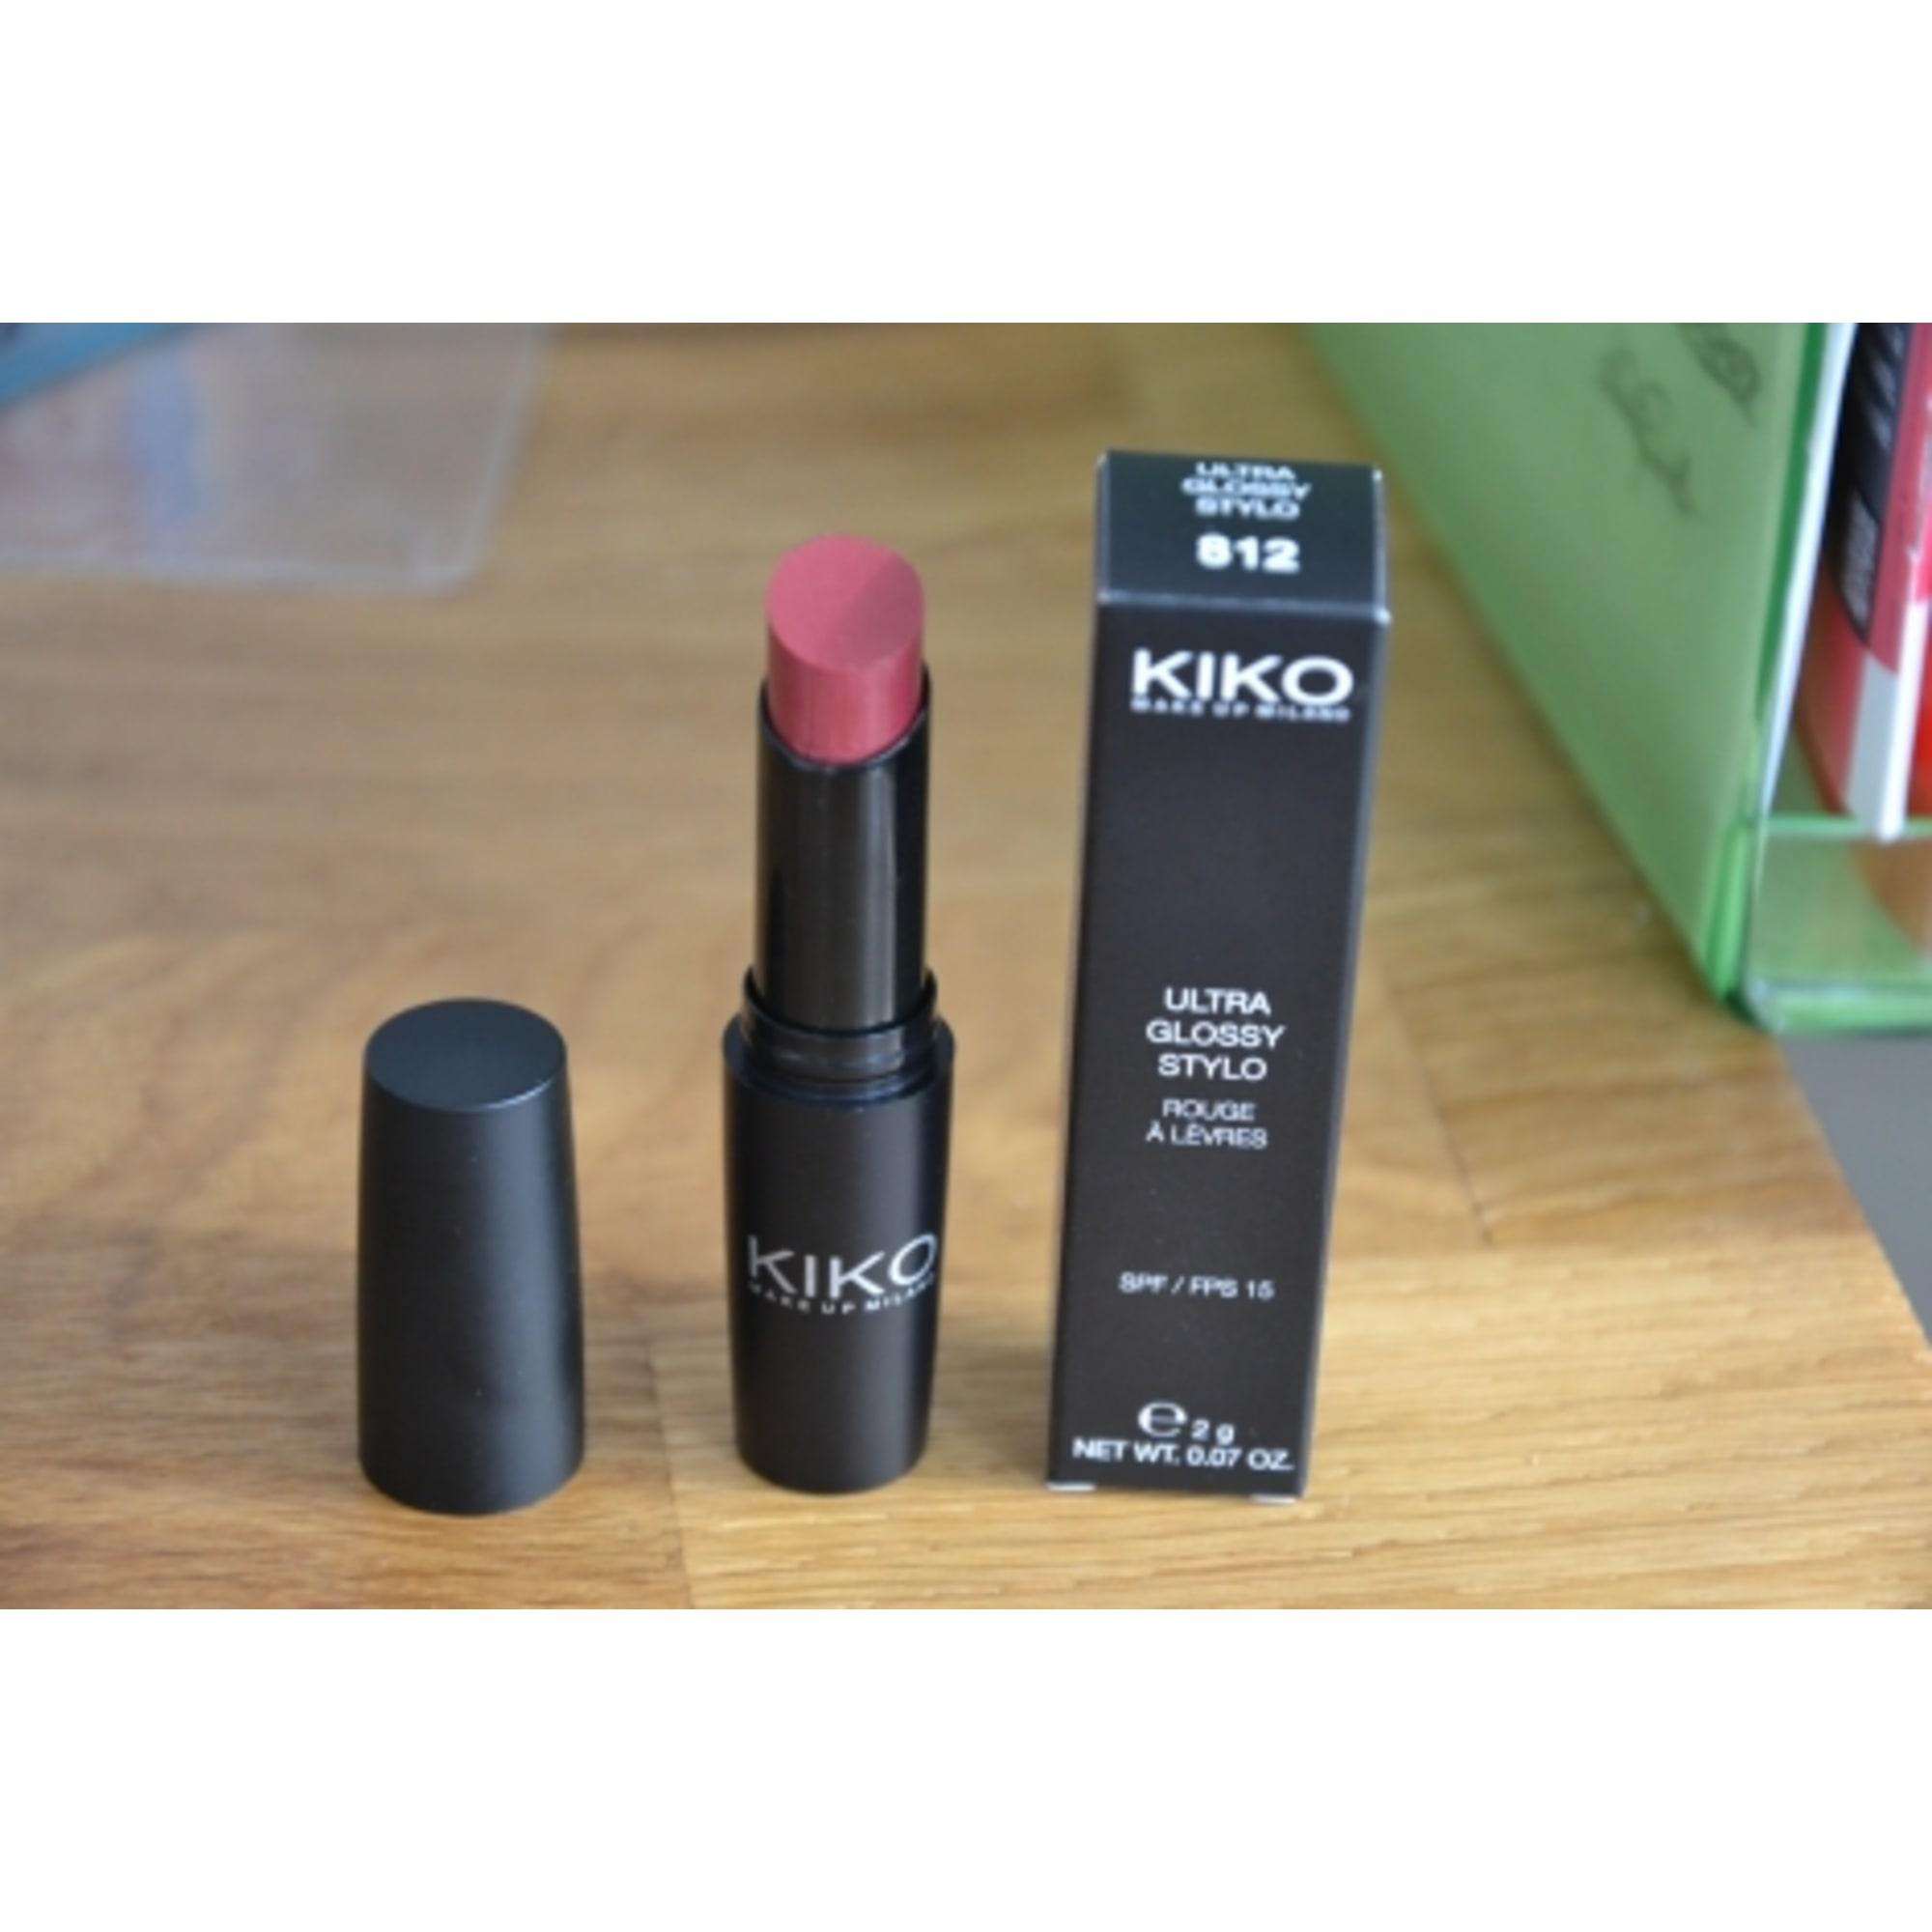 Rouge à lèvres KIKO black cherry - 1101070 31ae0f657b3e